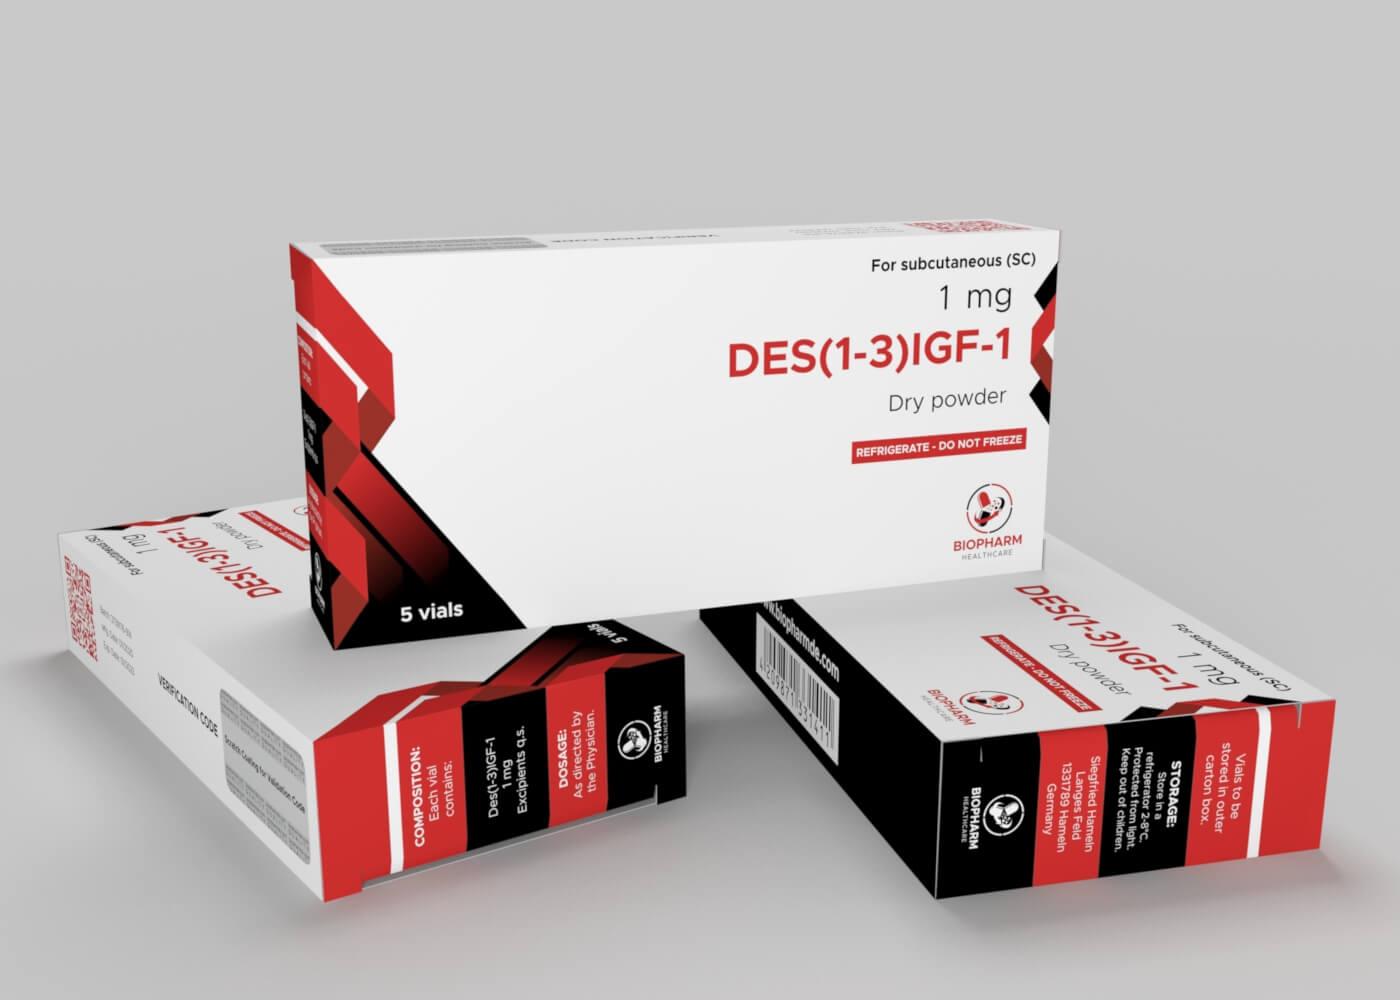 DES(1-3)IGF-1